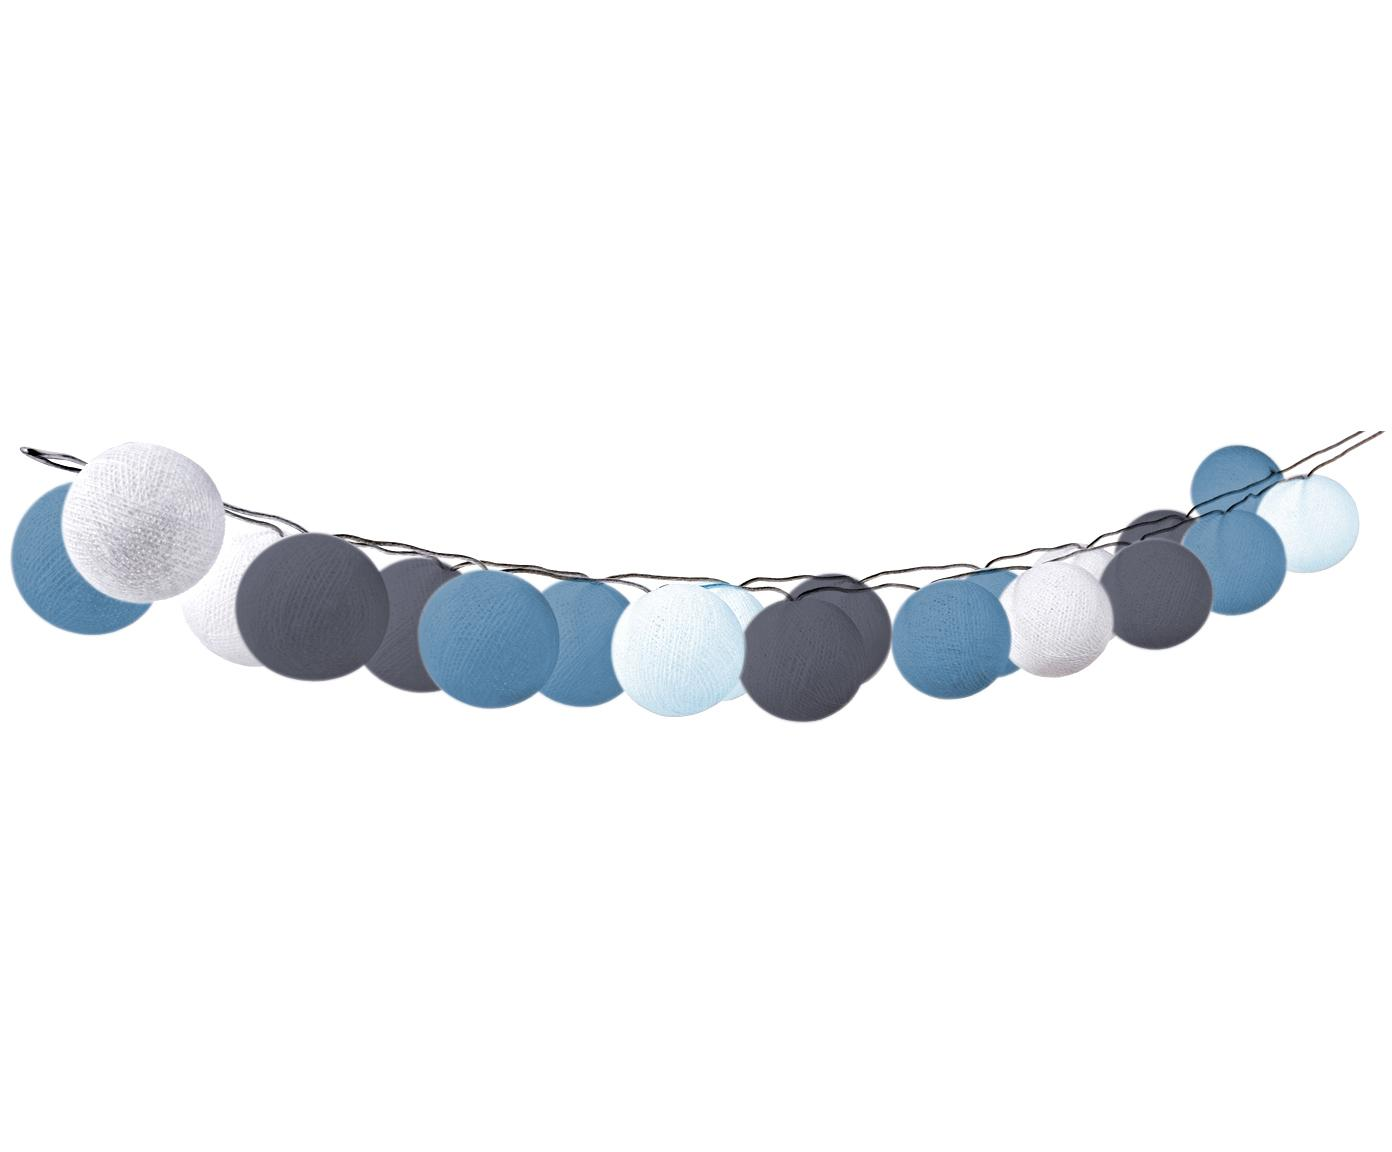 LED Lichterkette Bellin, 320 cm, Lampions: Baumwolle, Blau, Hellblau, Dunkelblau, Weiß, L 320 cm